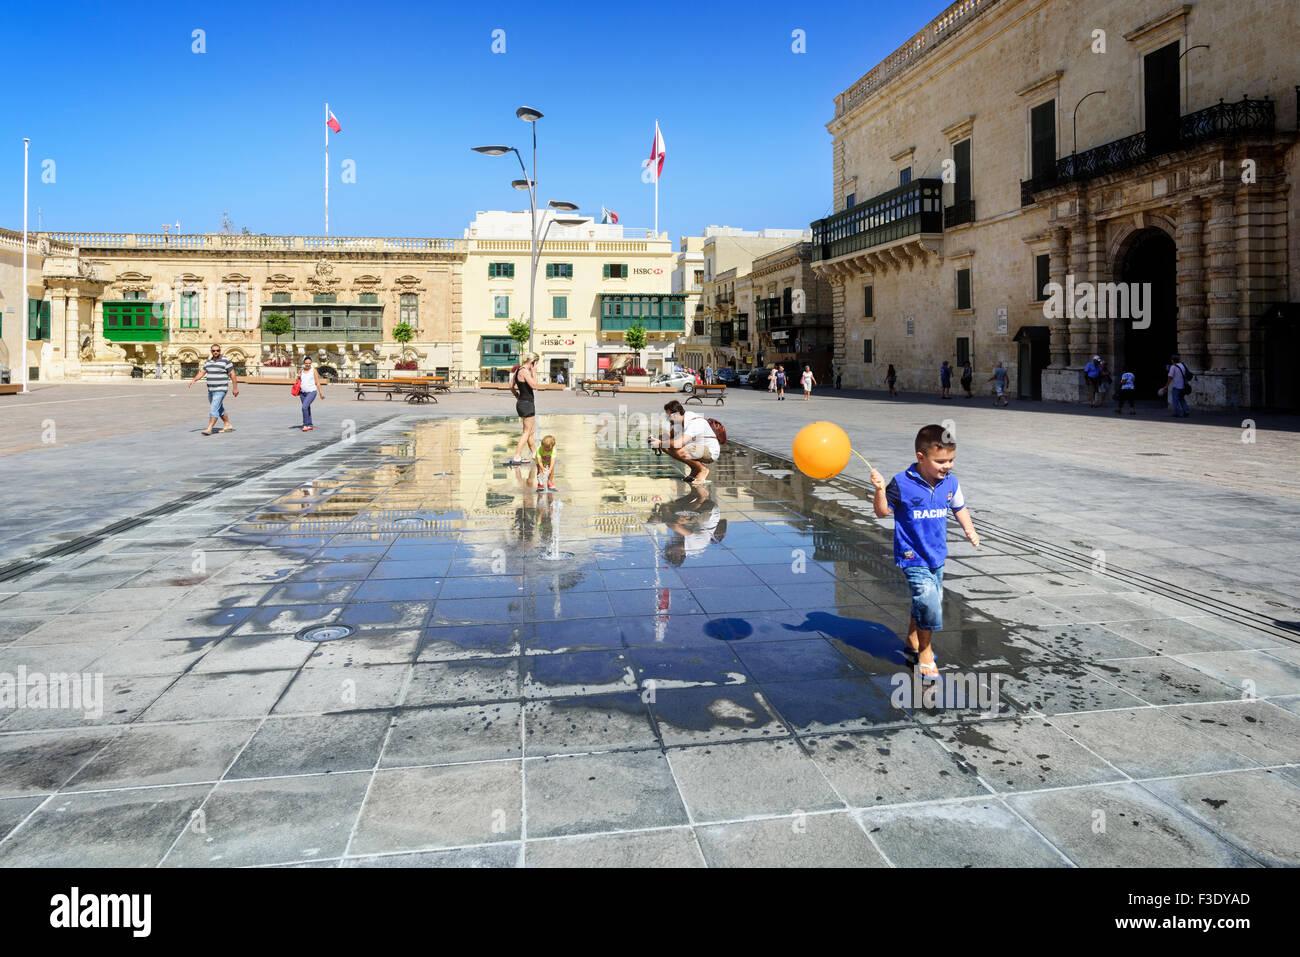 St George's Square, Valletta - Stock Image